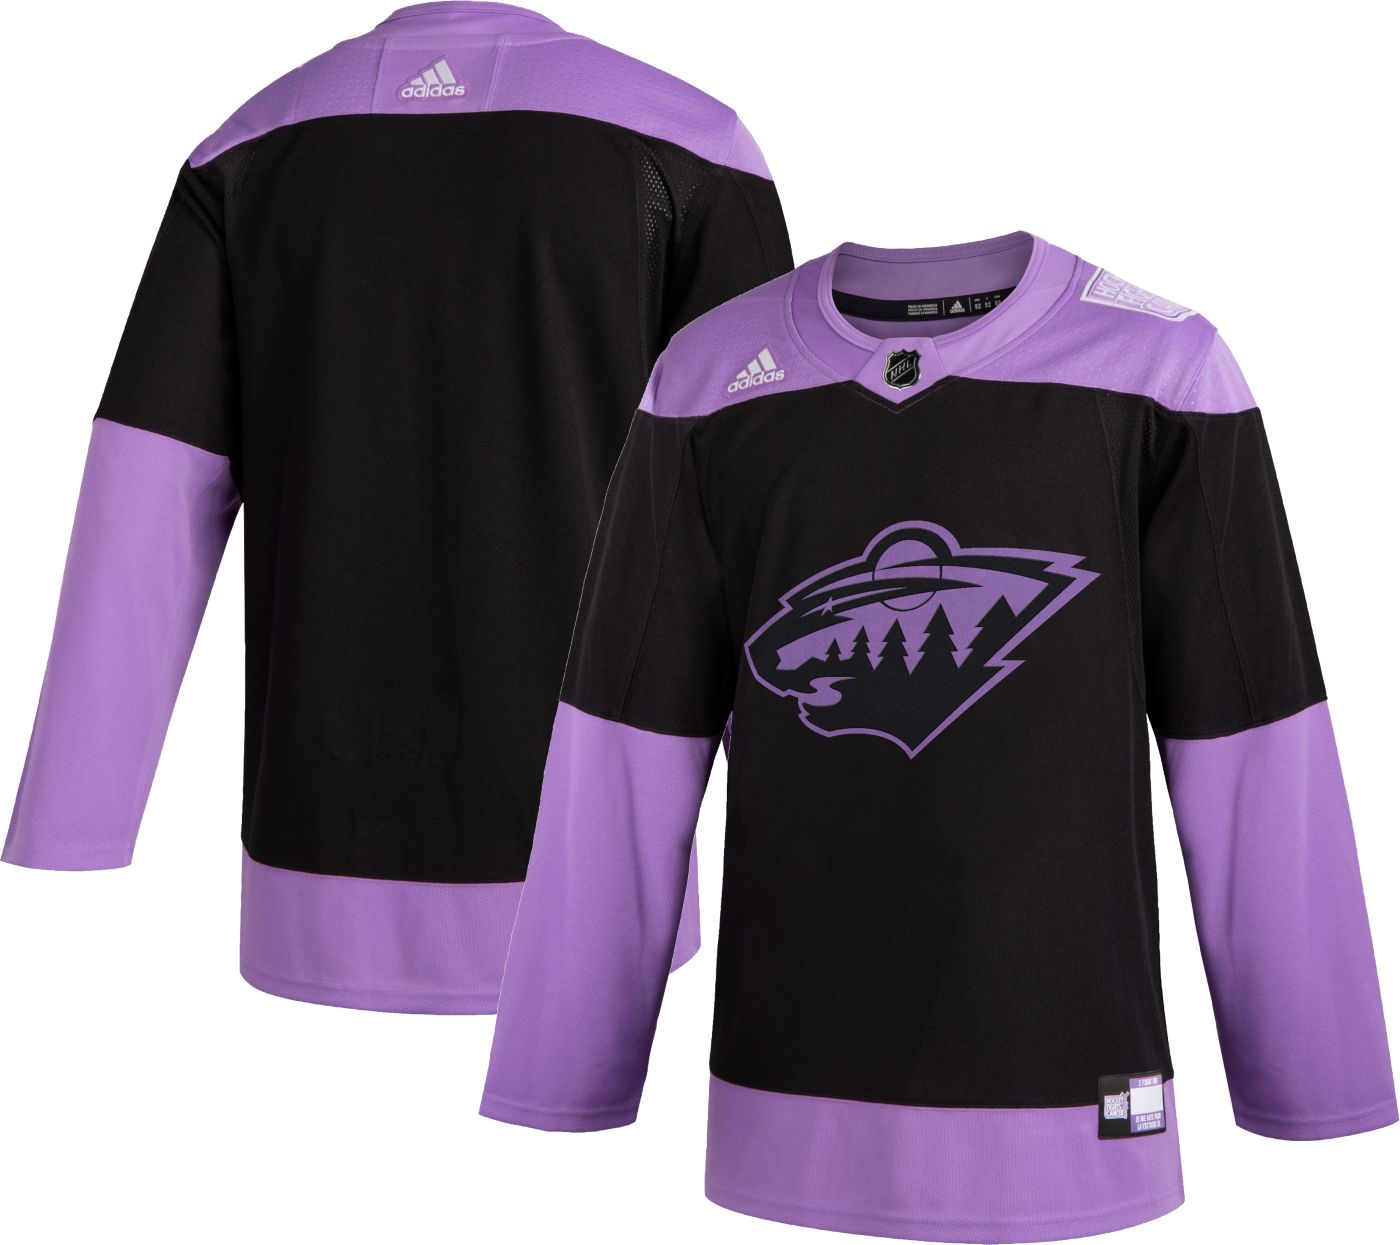 adidas Men's Minnesota Wild Hockey Fights Cancer Authentic Pro Jersey